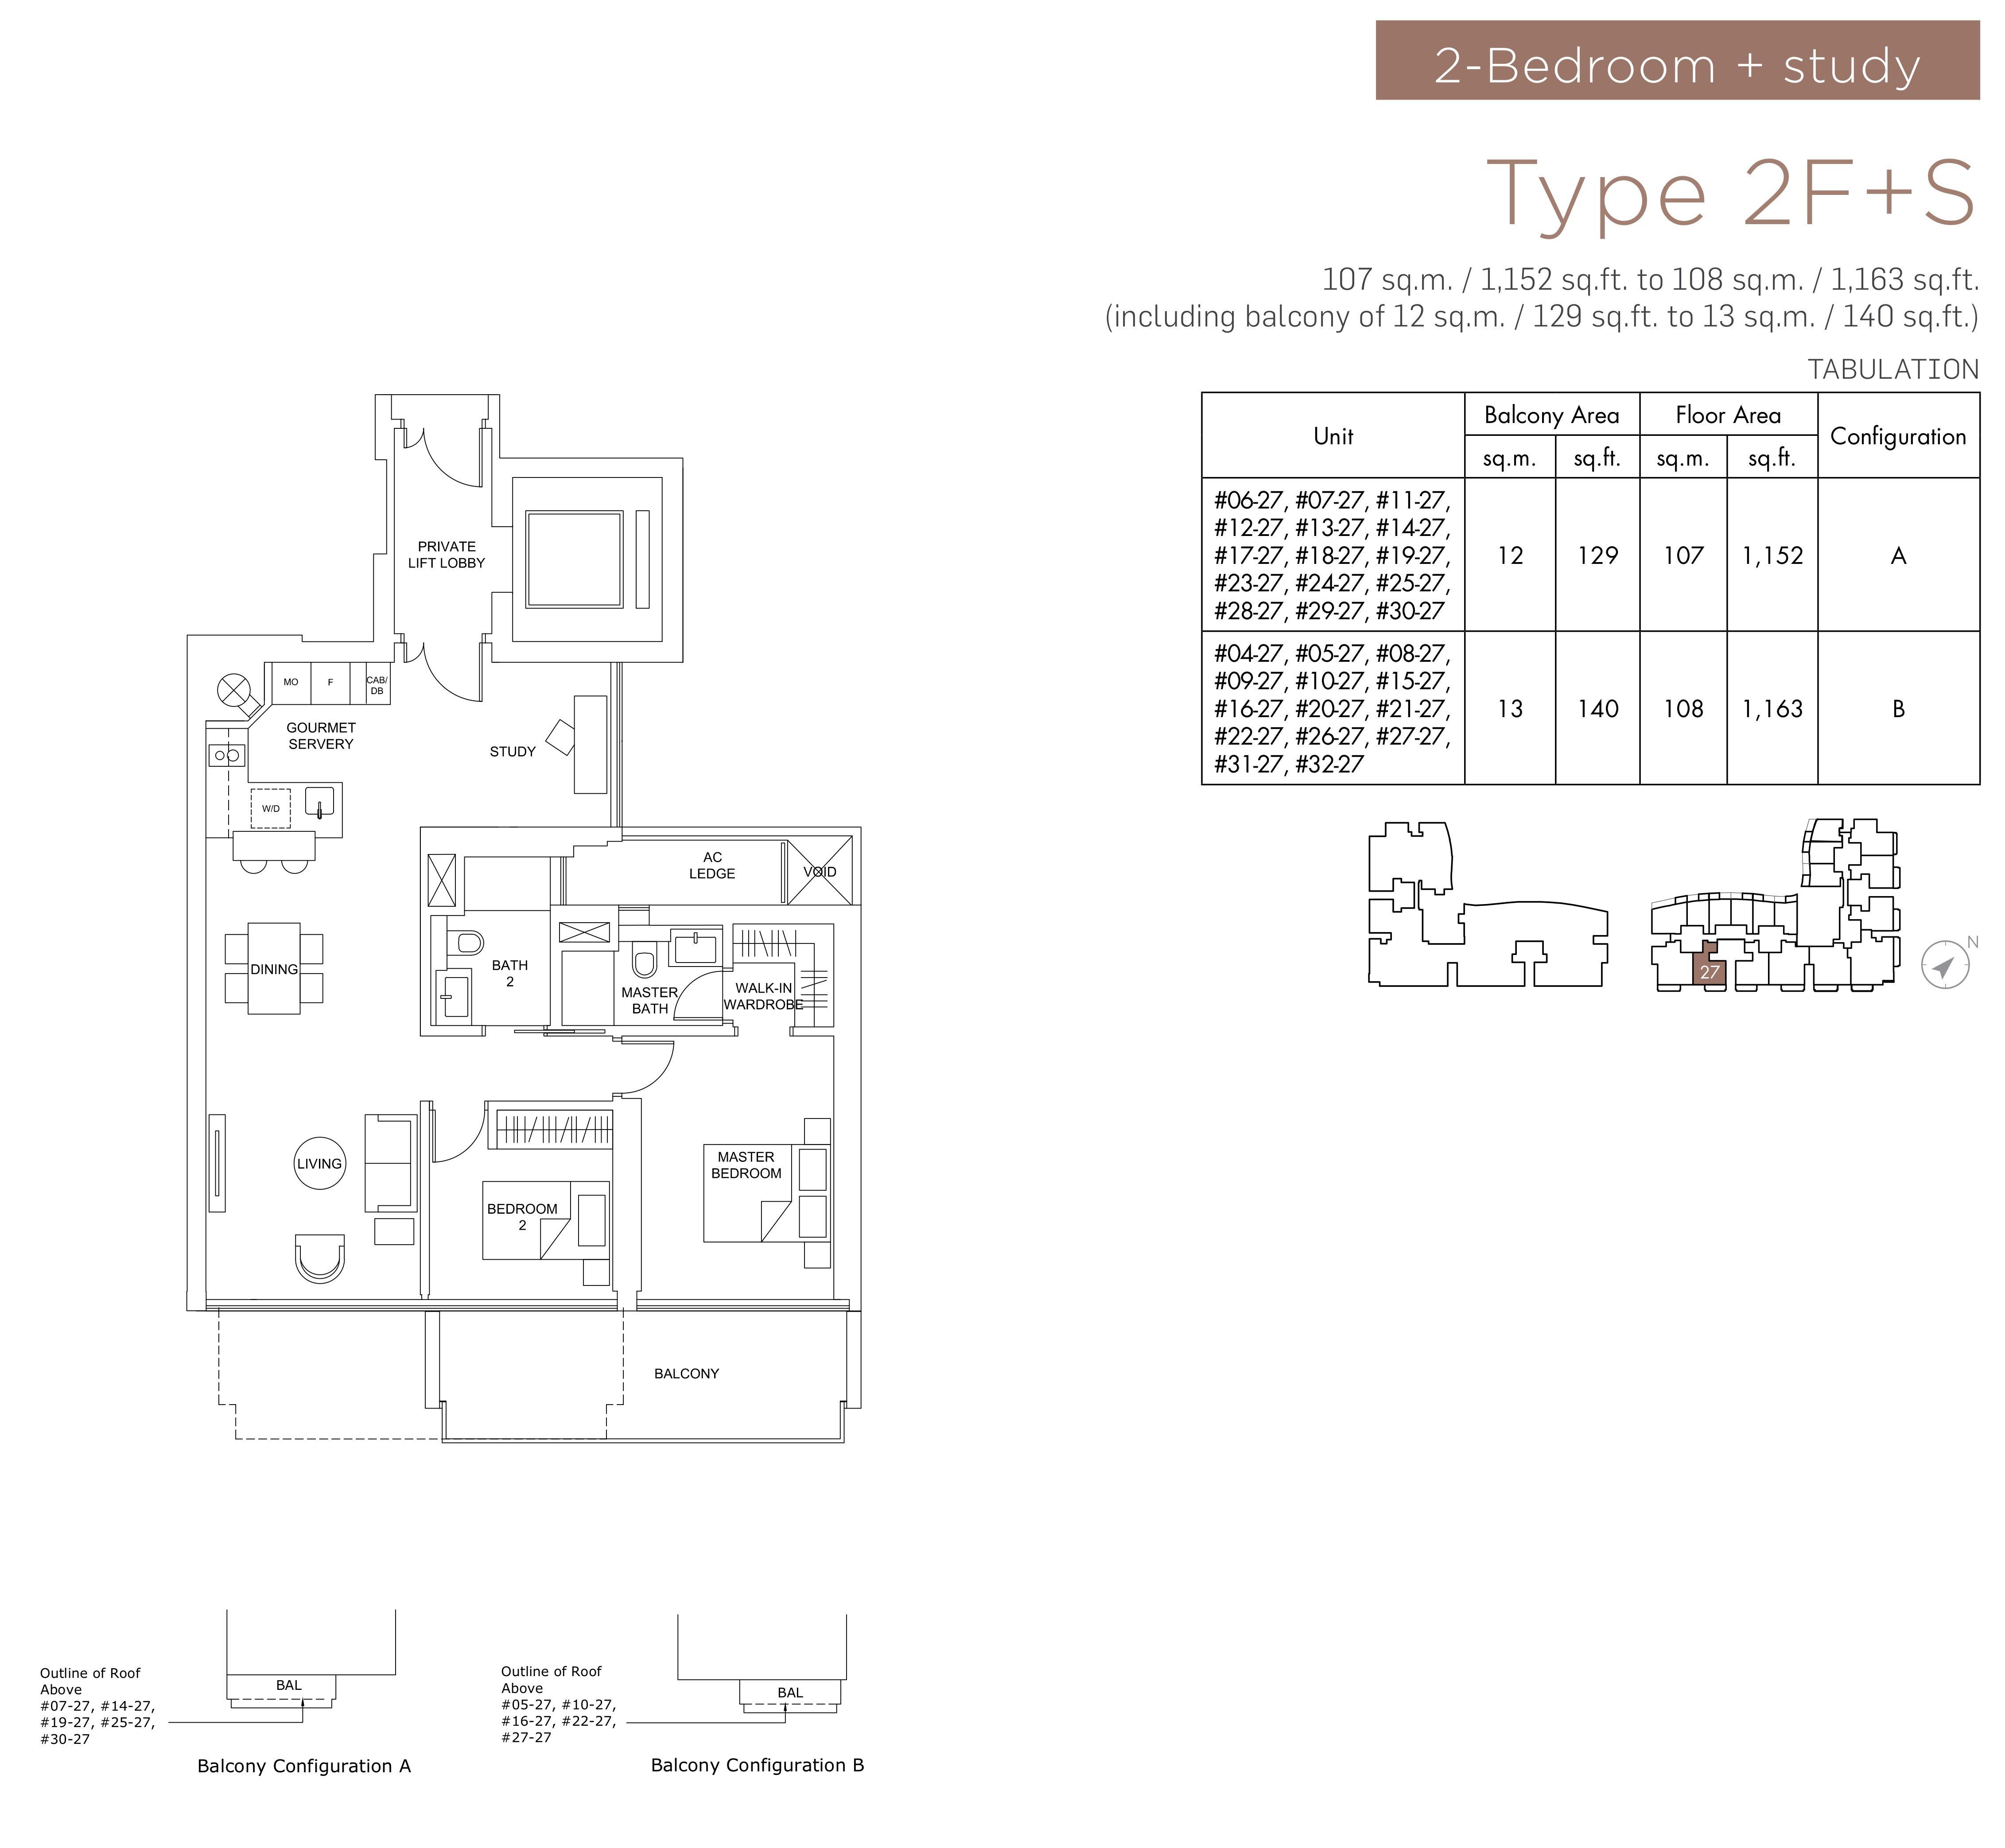 Marina One Residences 滨海盛景豪苑 floor plans 2 bedroom +study 2F+S